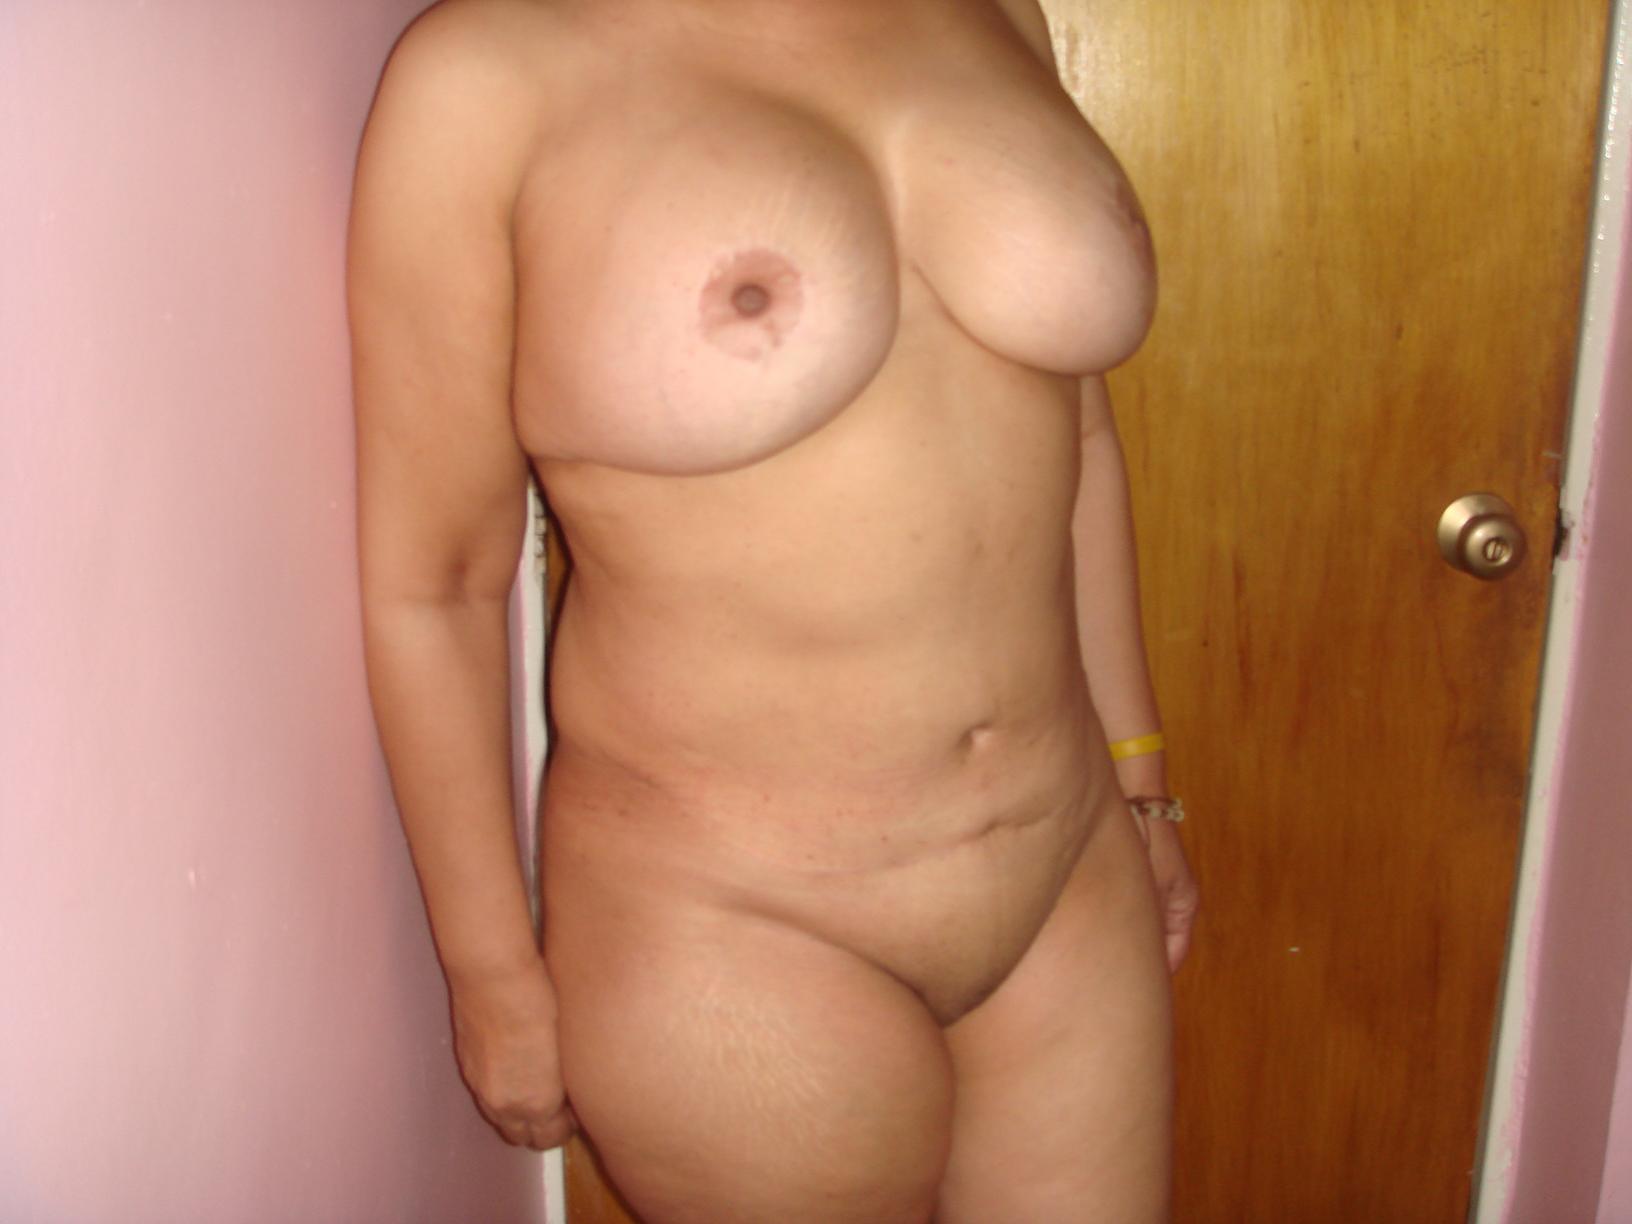 Mi Esposa Ensenando Sus Grandes Tetas Free Sex